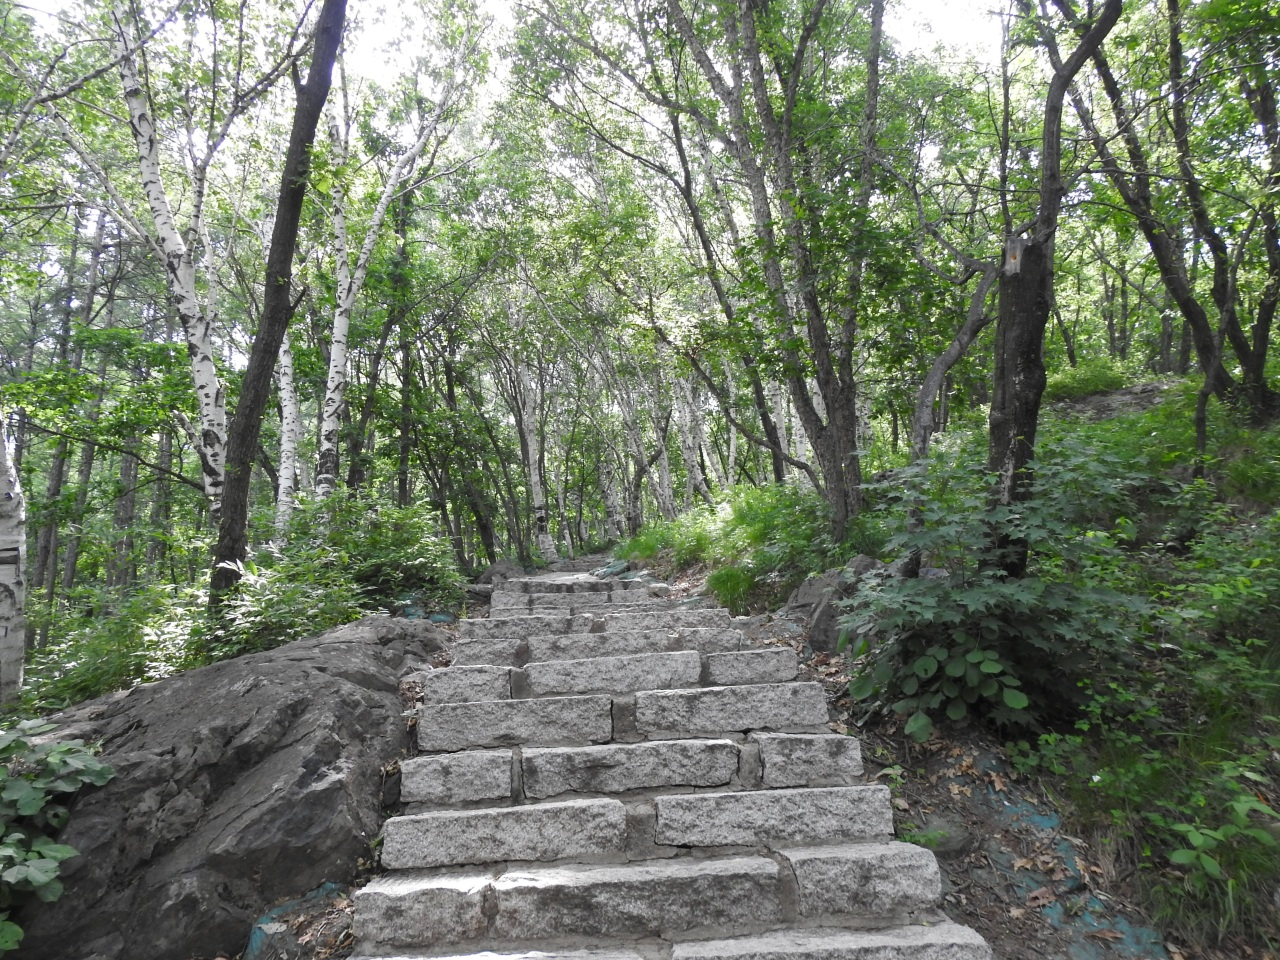 Baihuashan